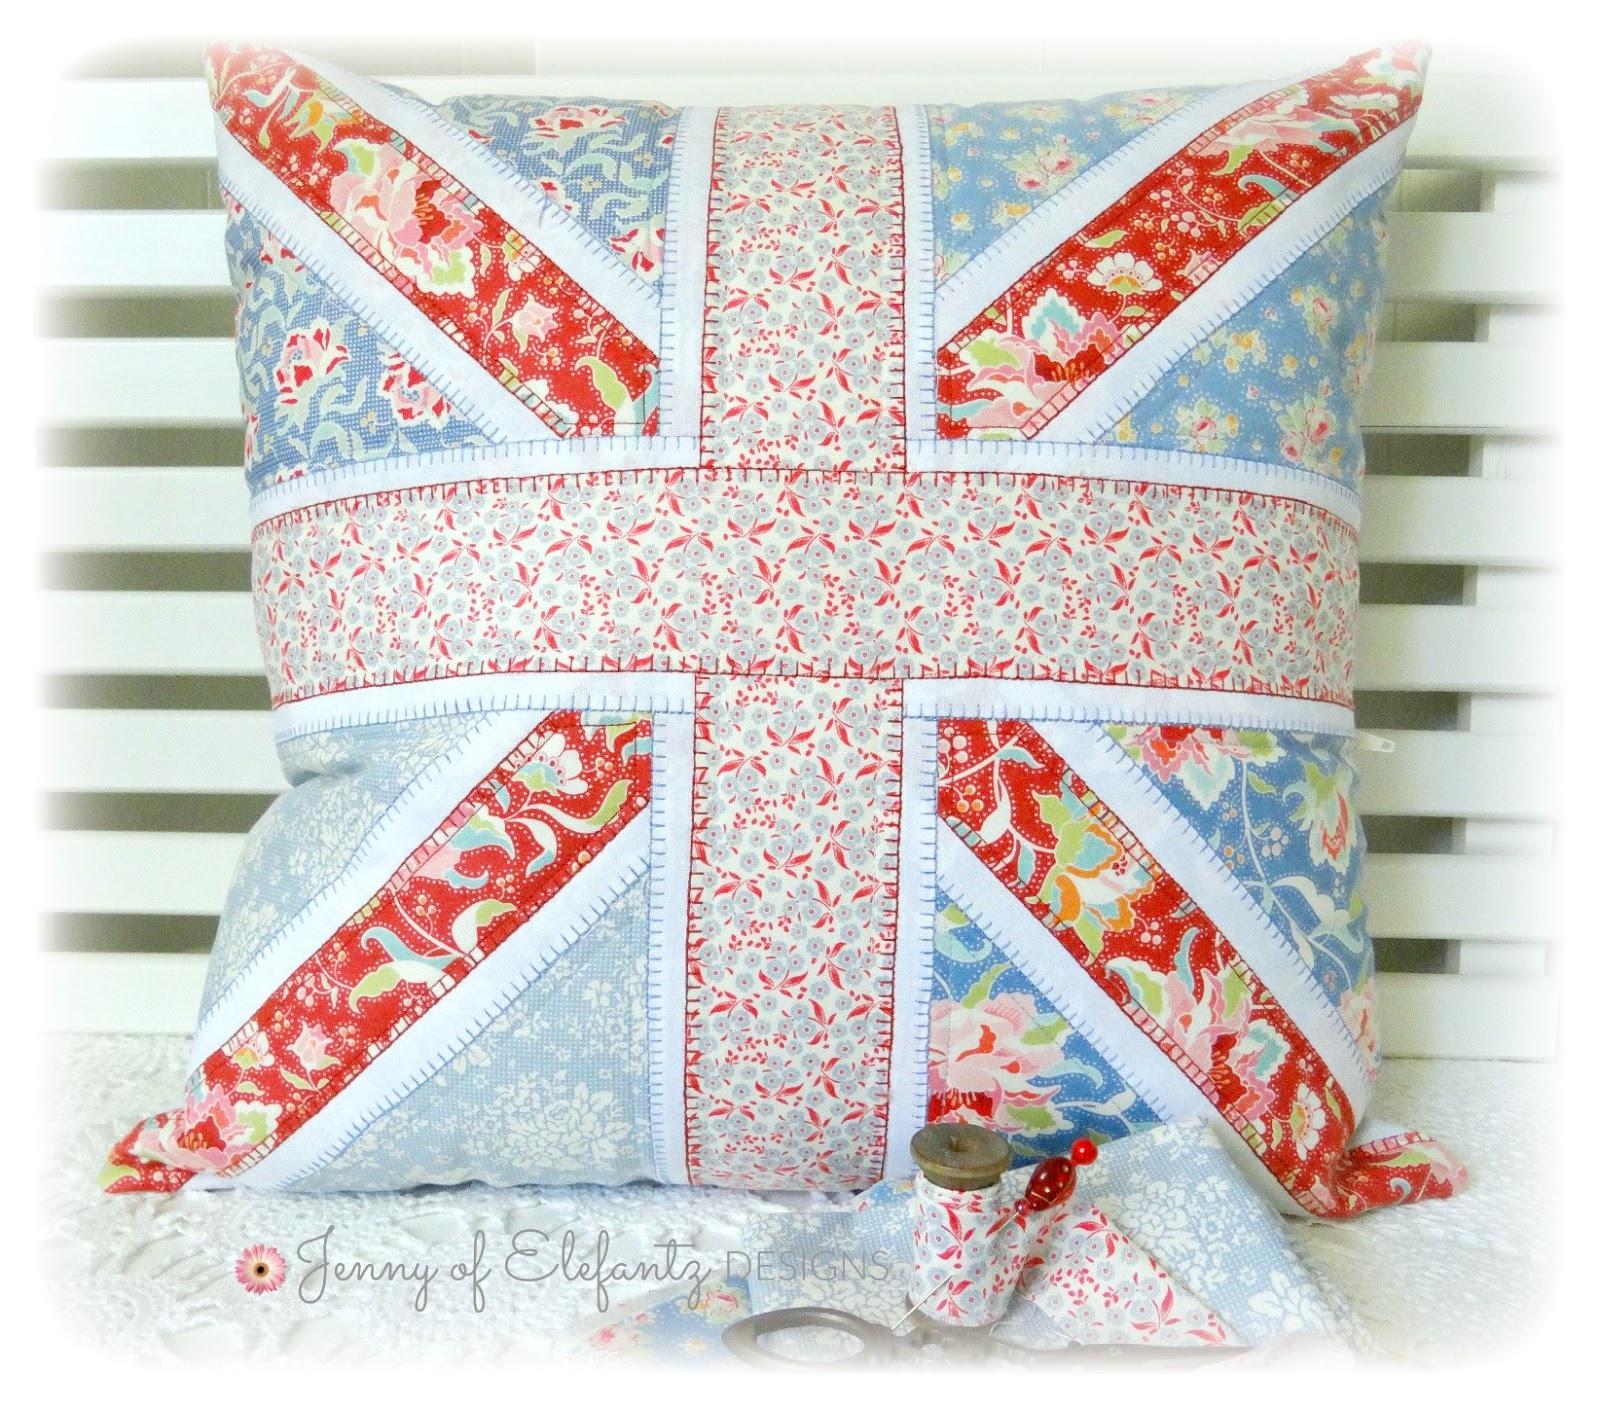 Jenny of ELEFANTZ: Free pattern!! Sew a Union Jack pillow